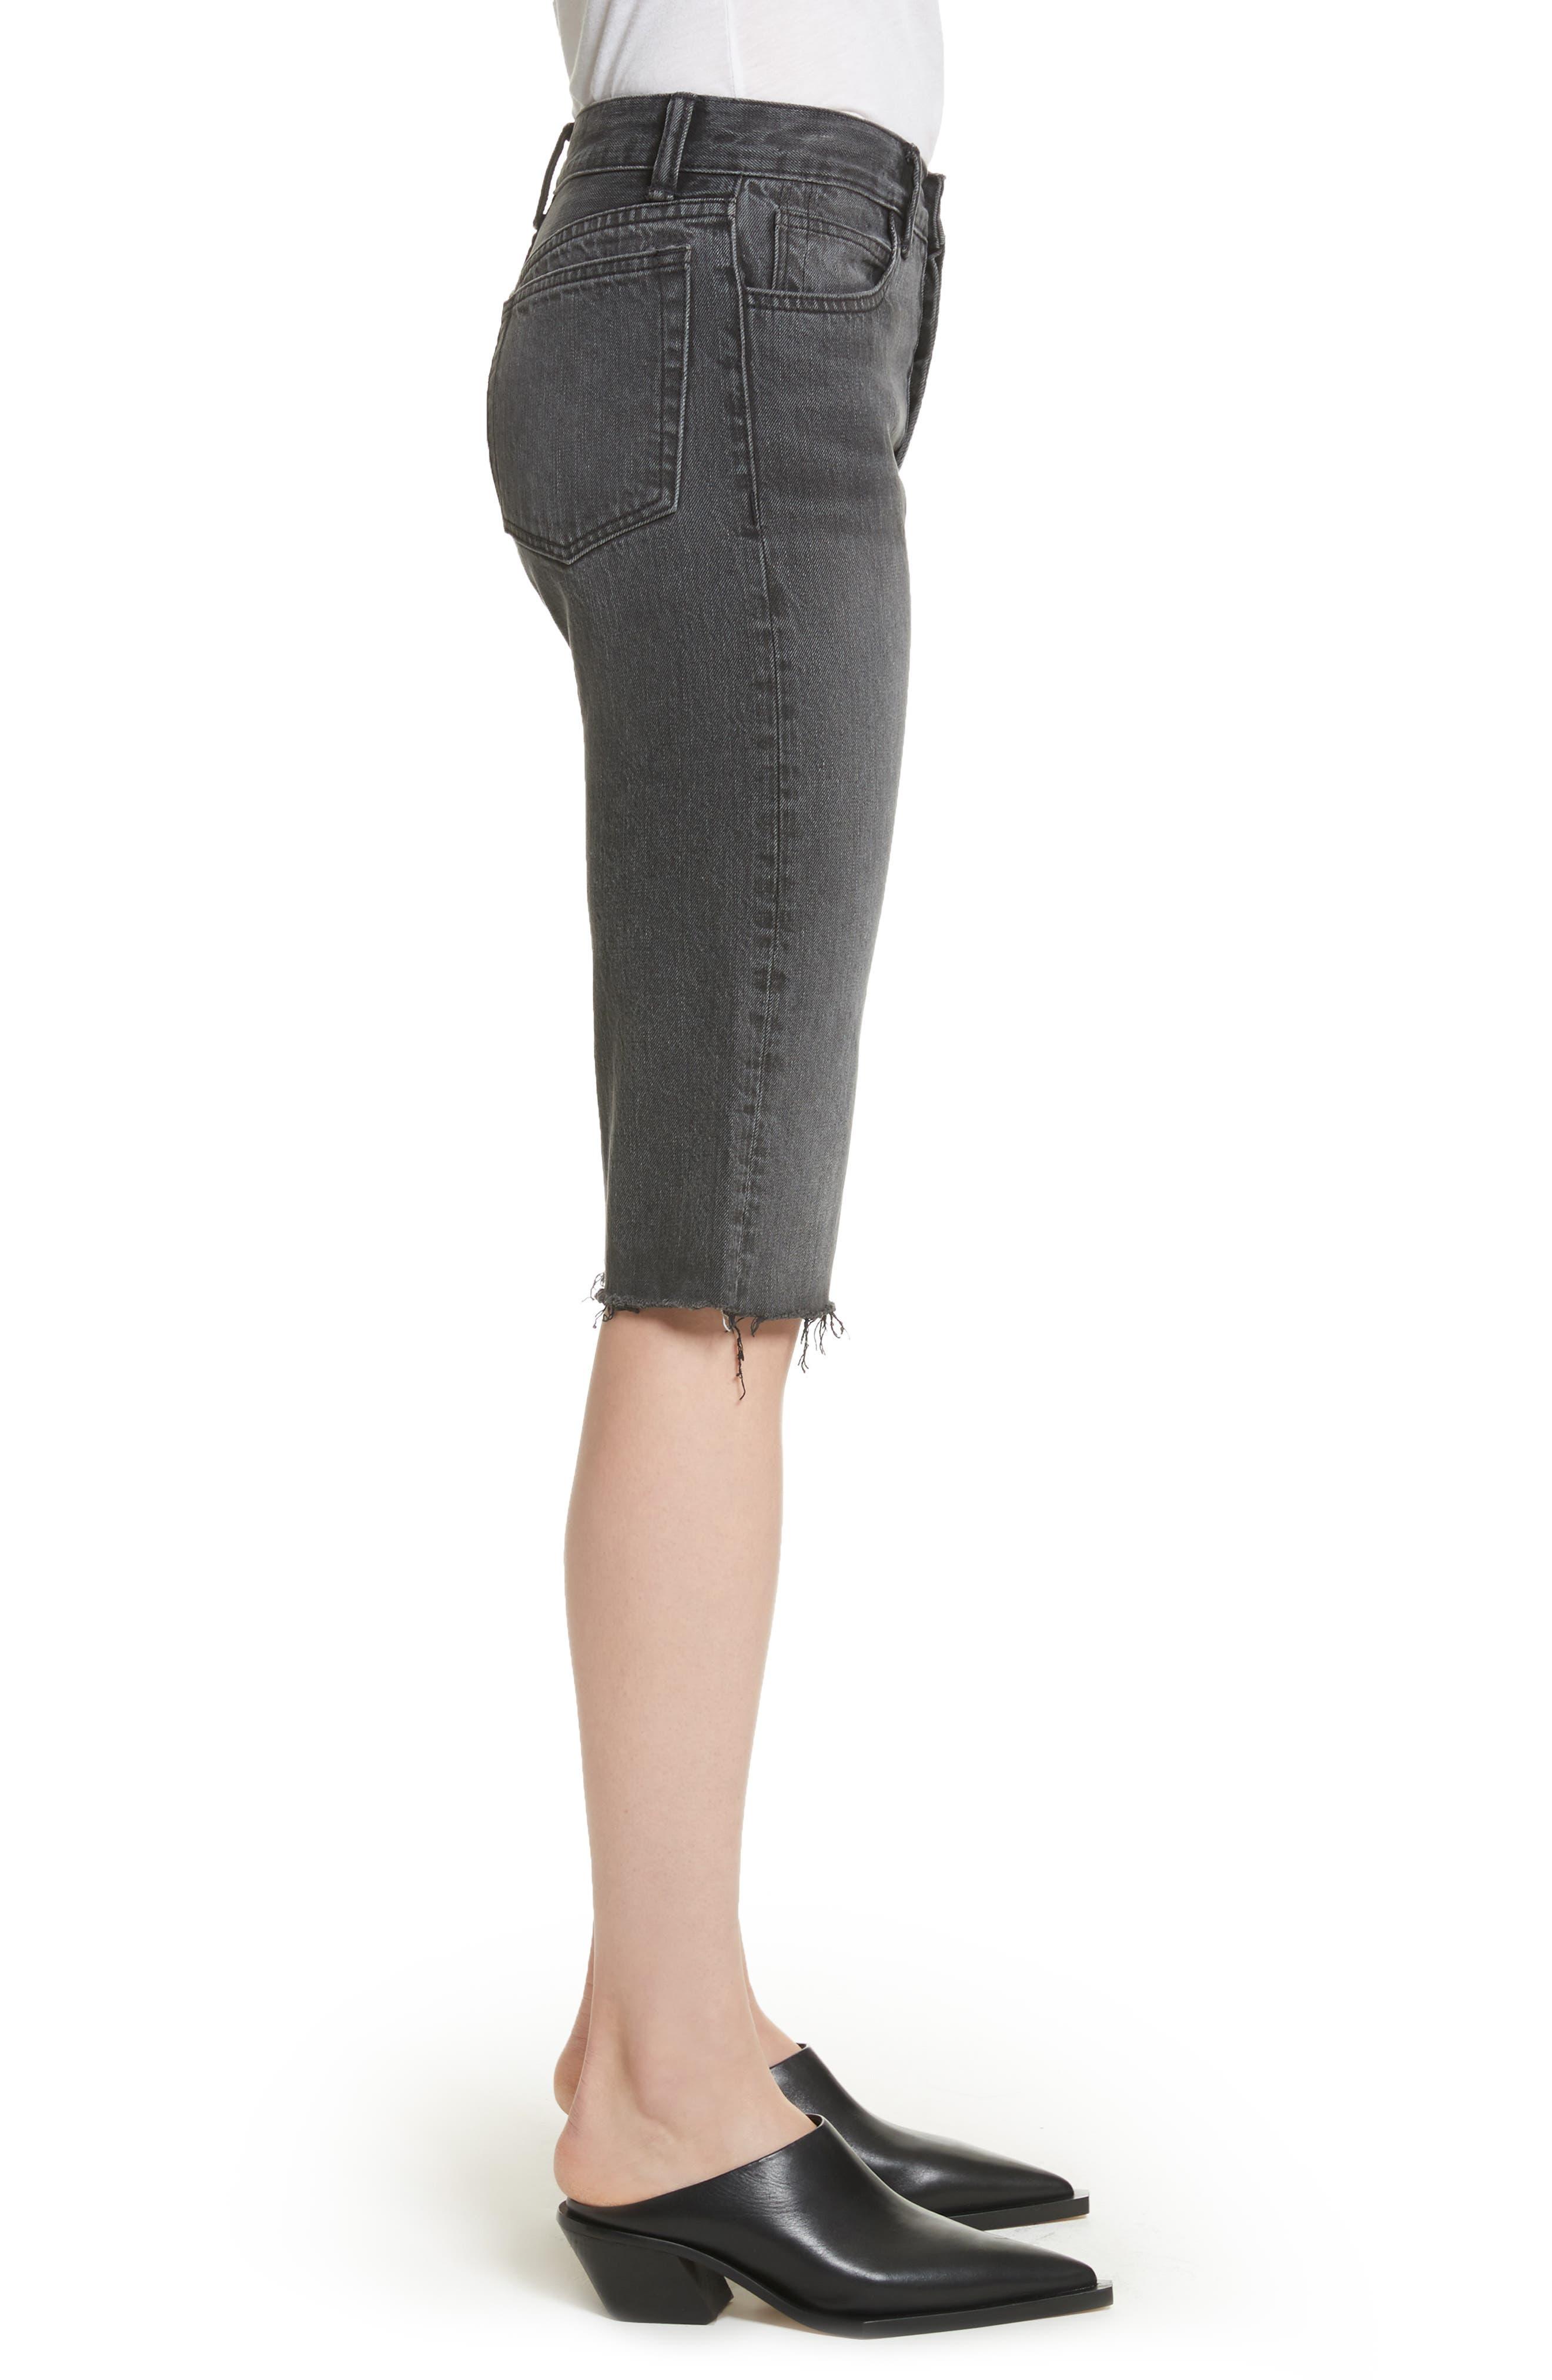 Cutoff Knee Length Denim Shorts,                             Alternate thumbnail 3, color,                             Rigid Black